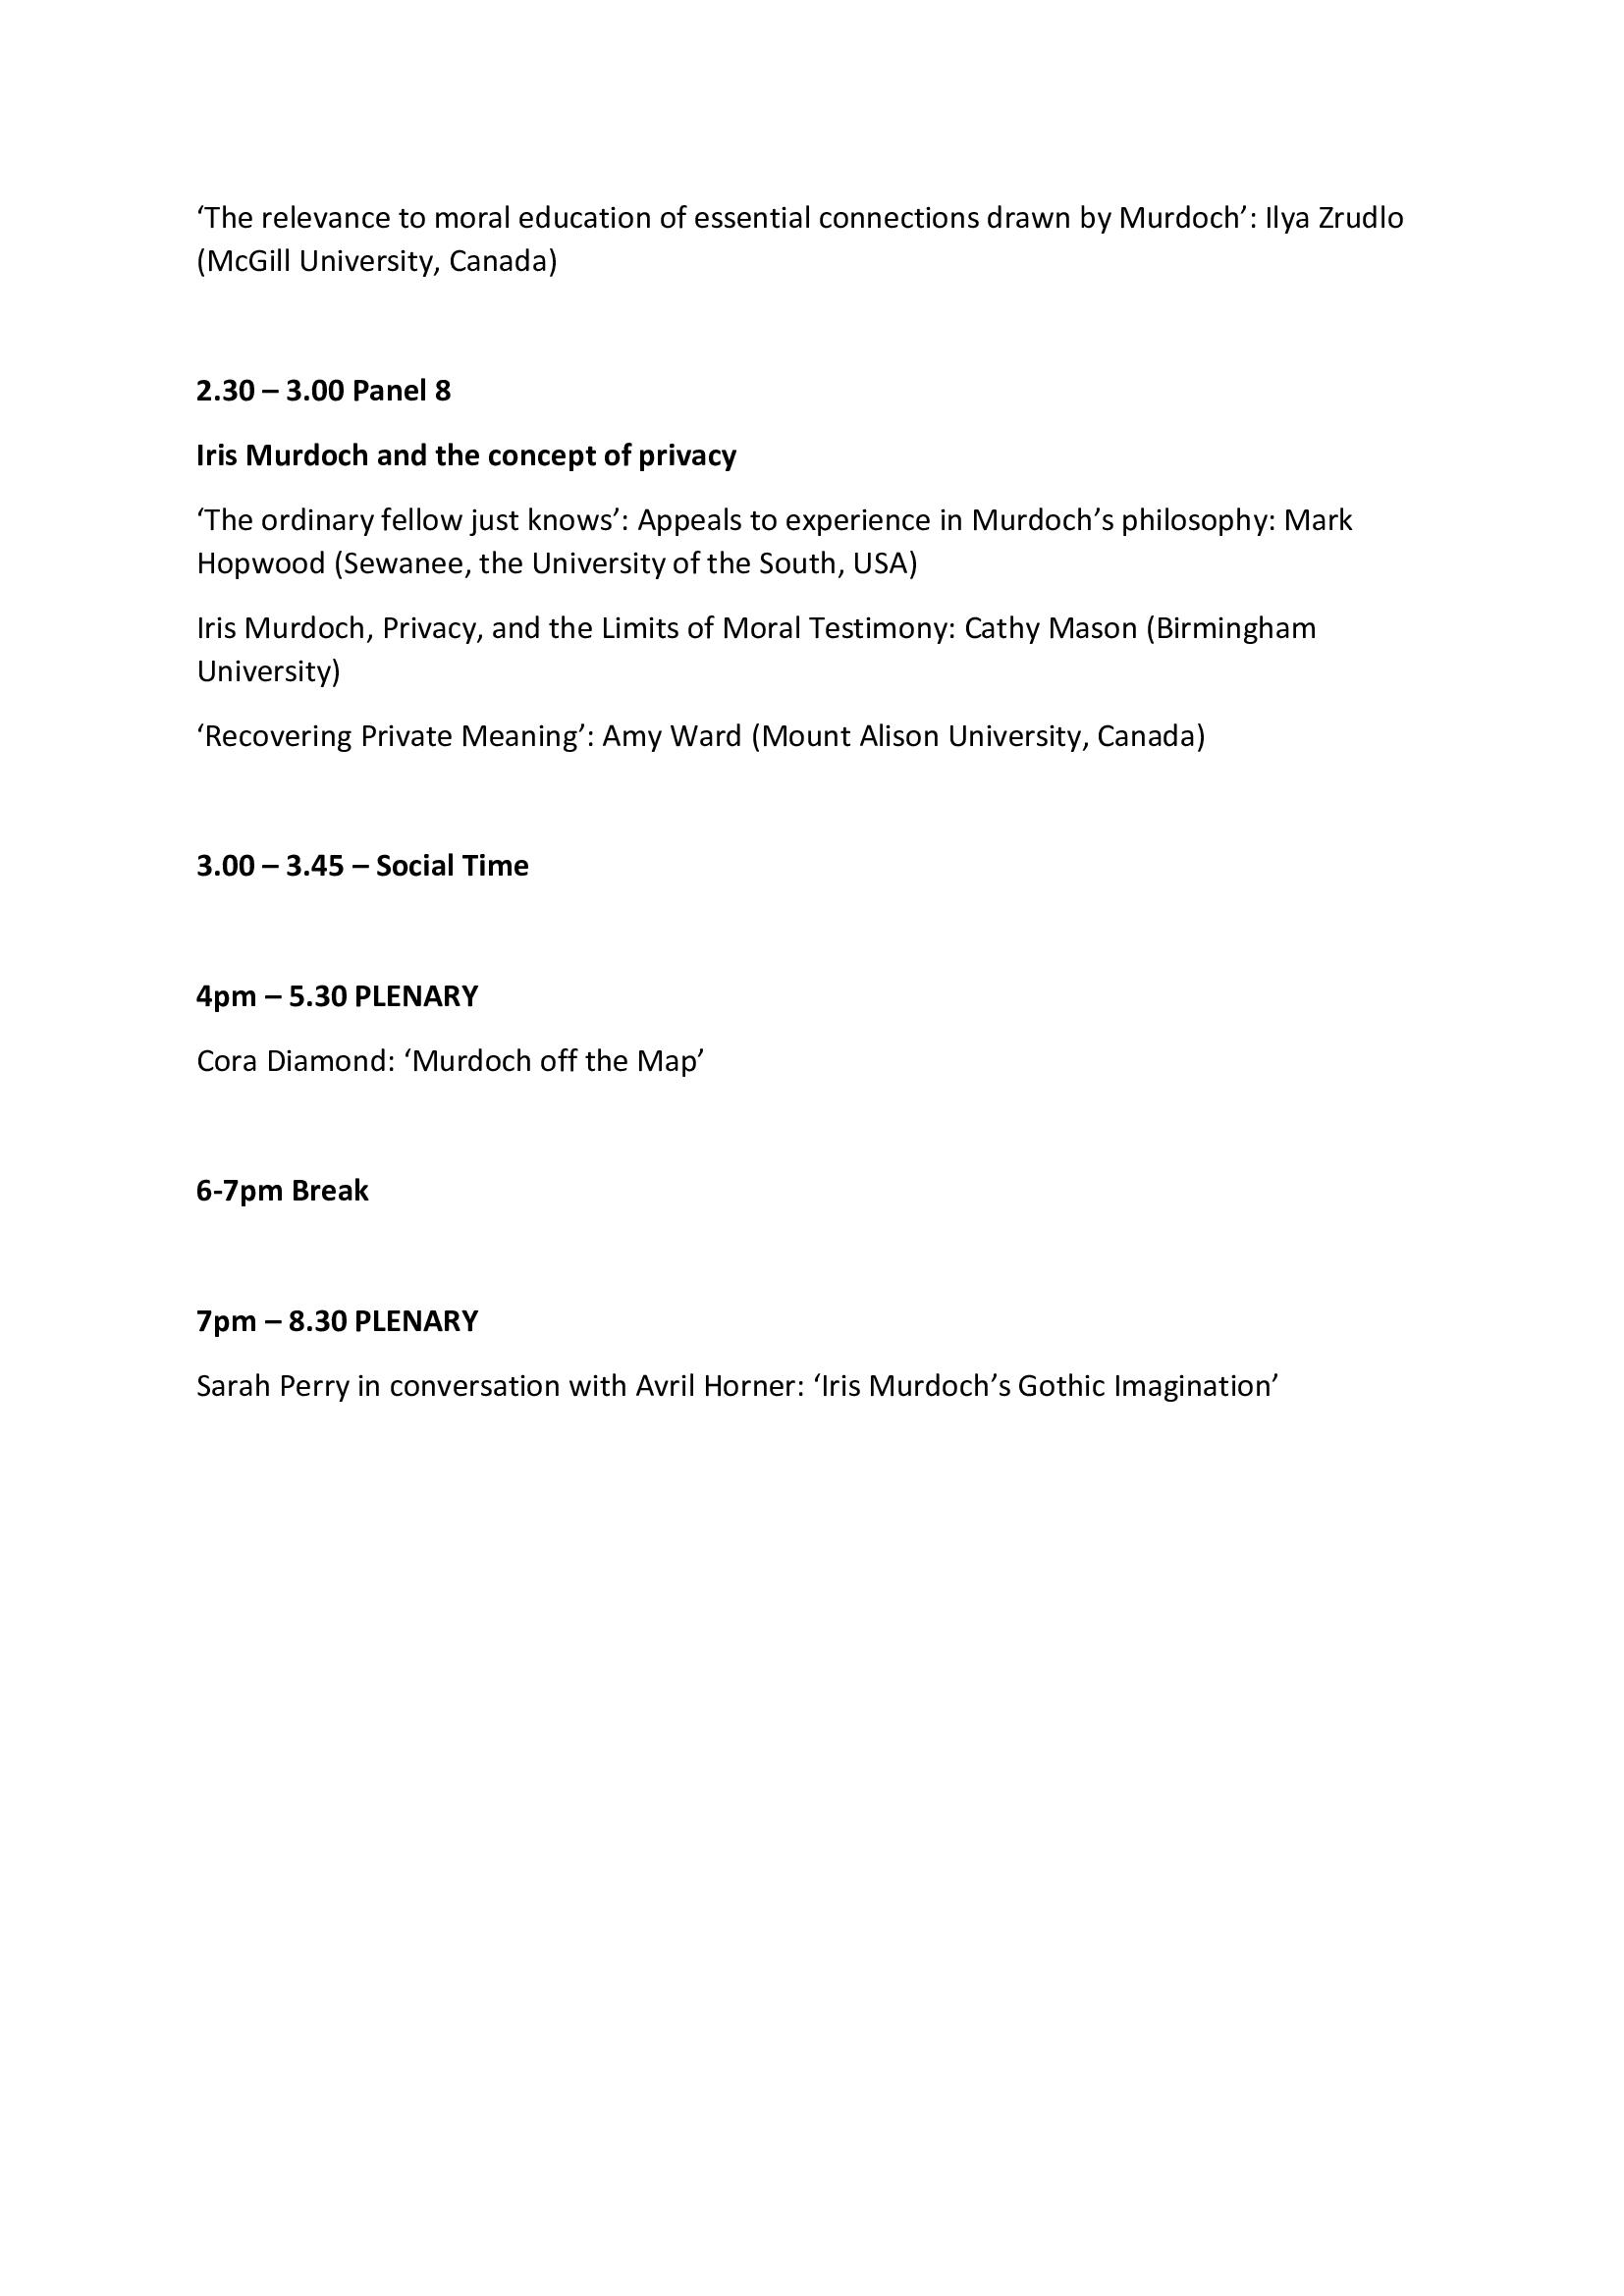 Online Conference Programme 3/3